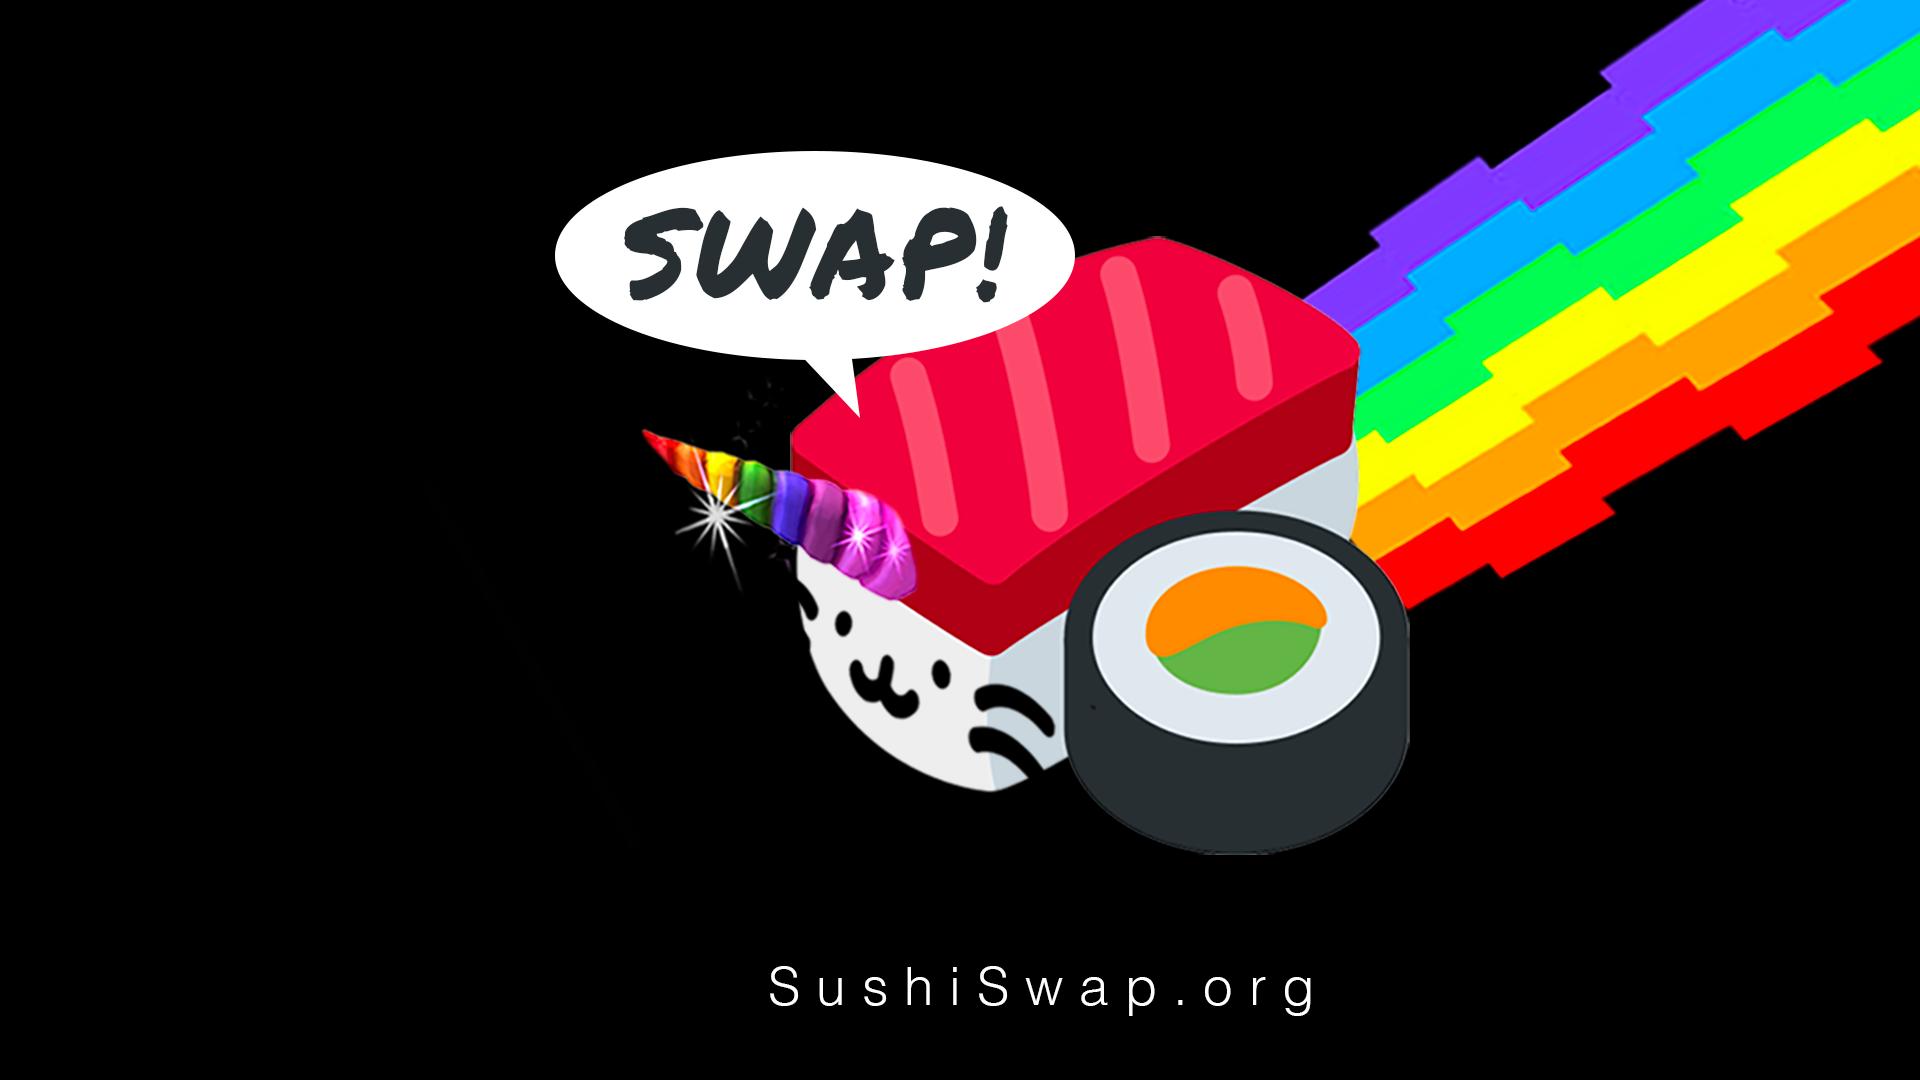 Спустя три дня после анонса DeFi-проект SushiSwap собрал $700 млн    Криптовалюта.Tech